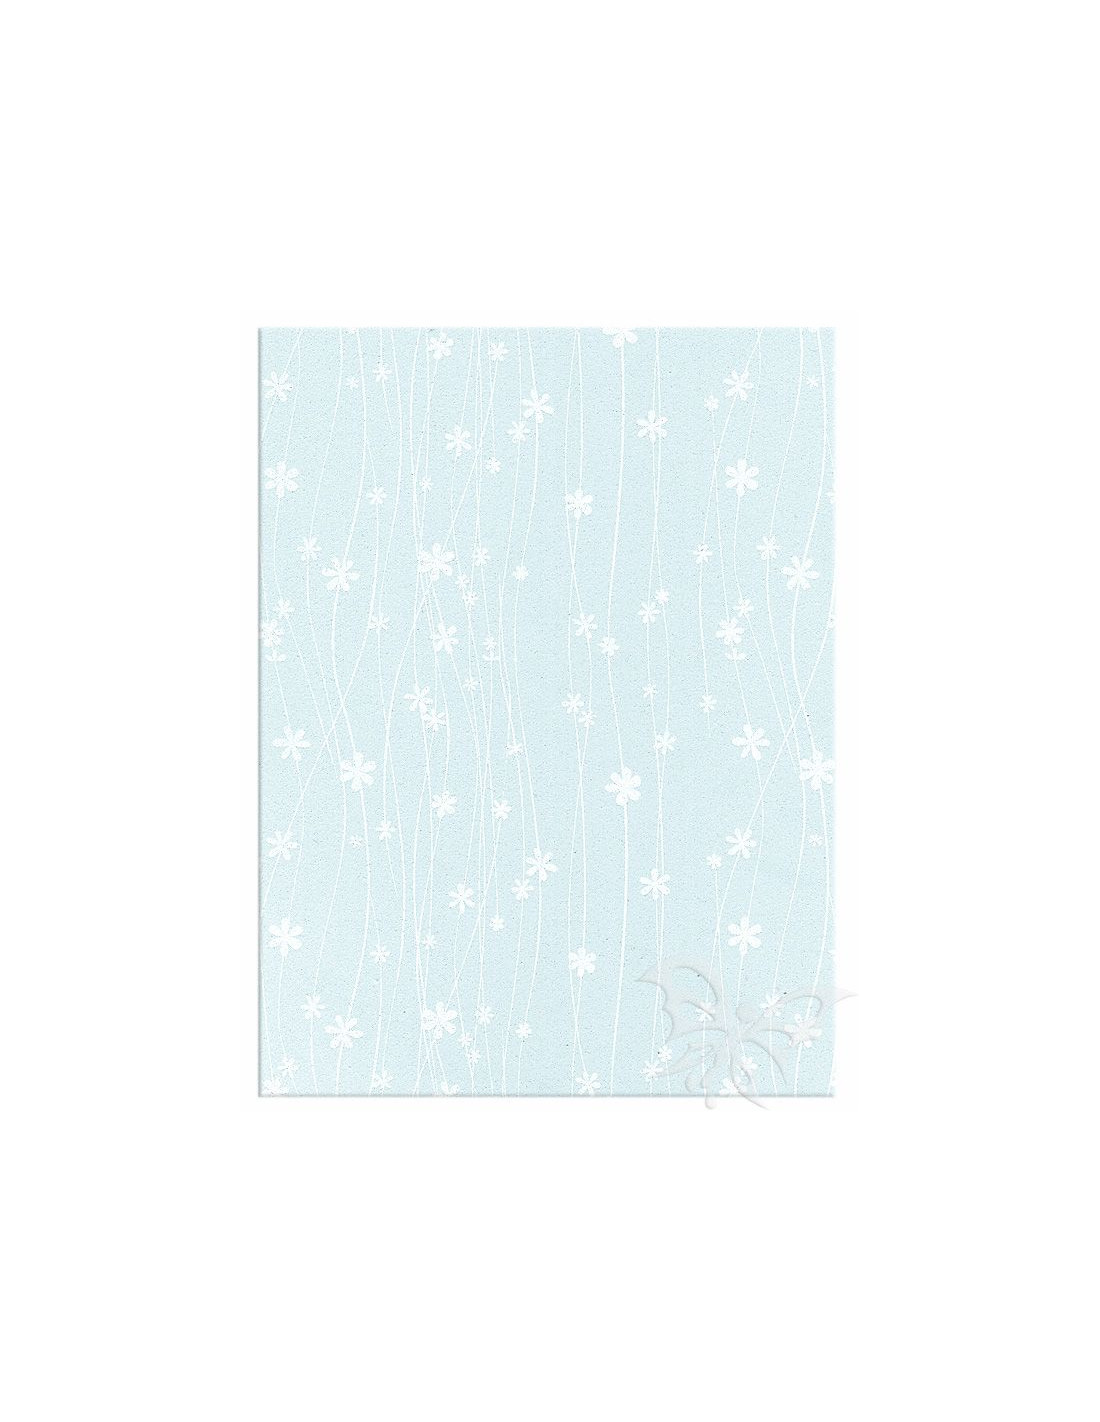 Foglio moosgummi fiori azzurro pastello bianco jpg 800x800 Pastello bianco 321132cb77d